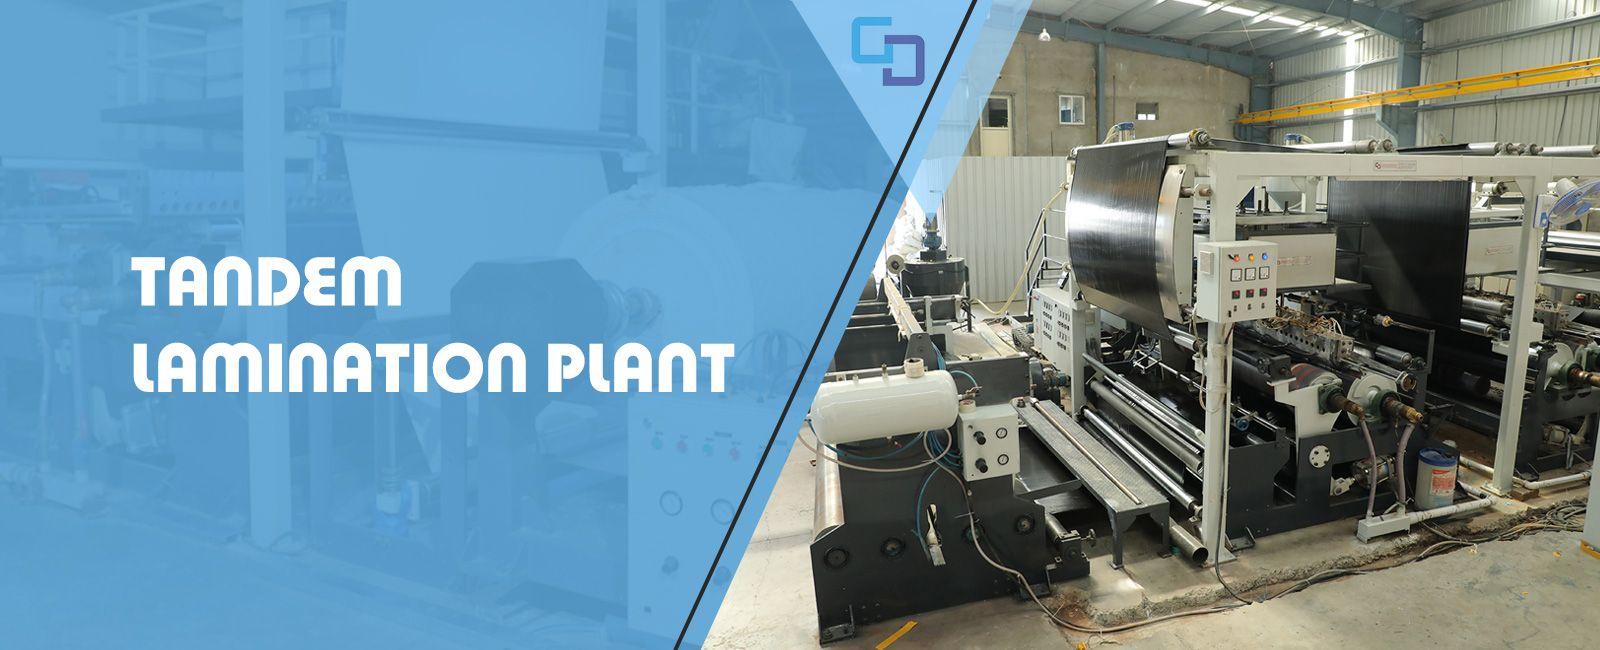 tarpaulin-lamination-machine-exporter